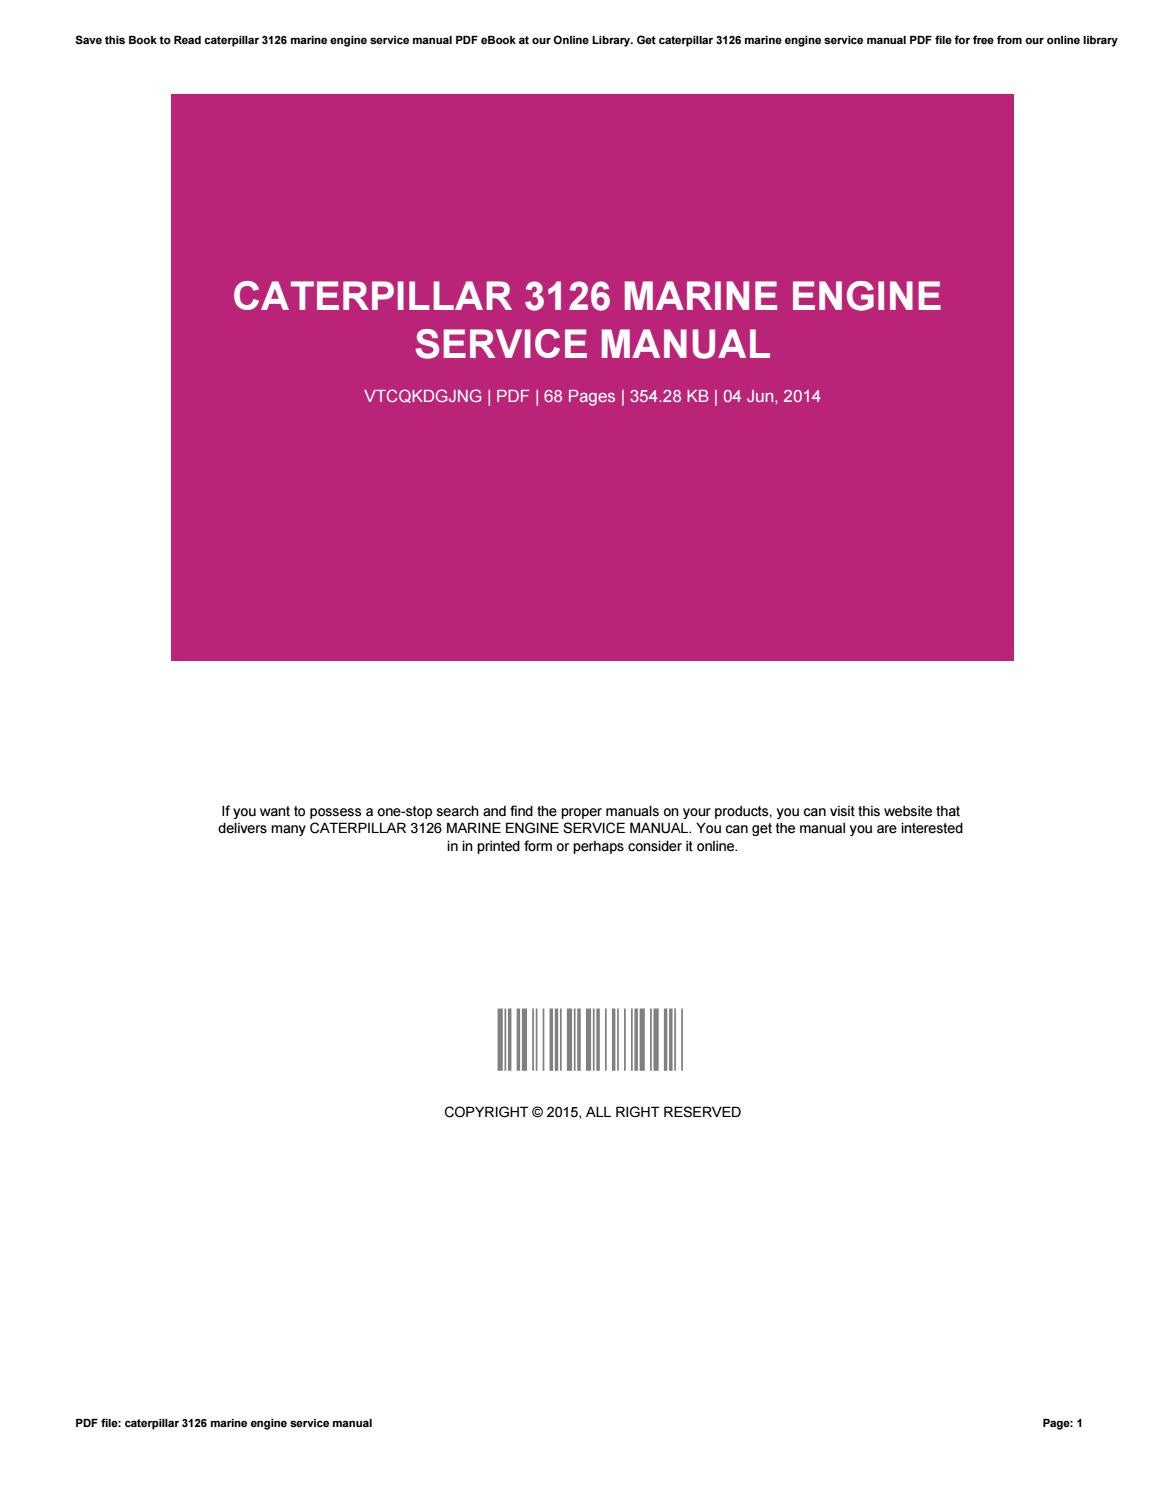 Caterpillar 3126 marine engine service manual by BeatriceMeans4064 - issuu